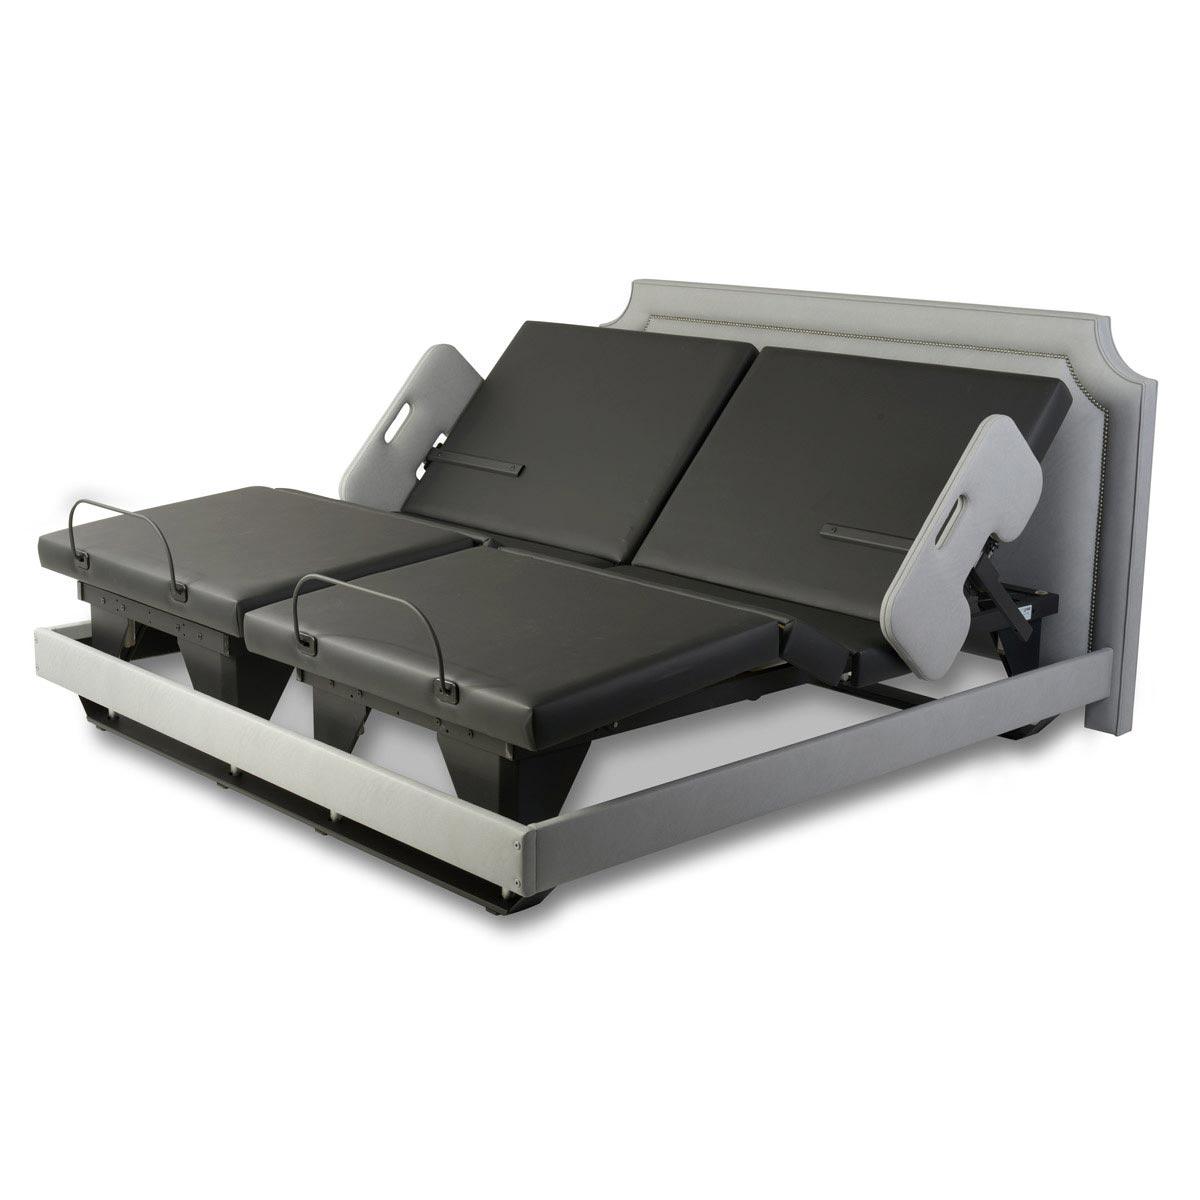 Signature Series Hi-Low Adjustable Bed | Assured Comfort